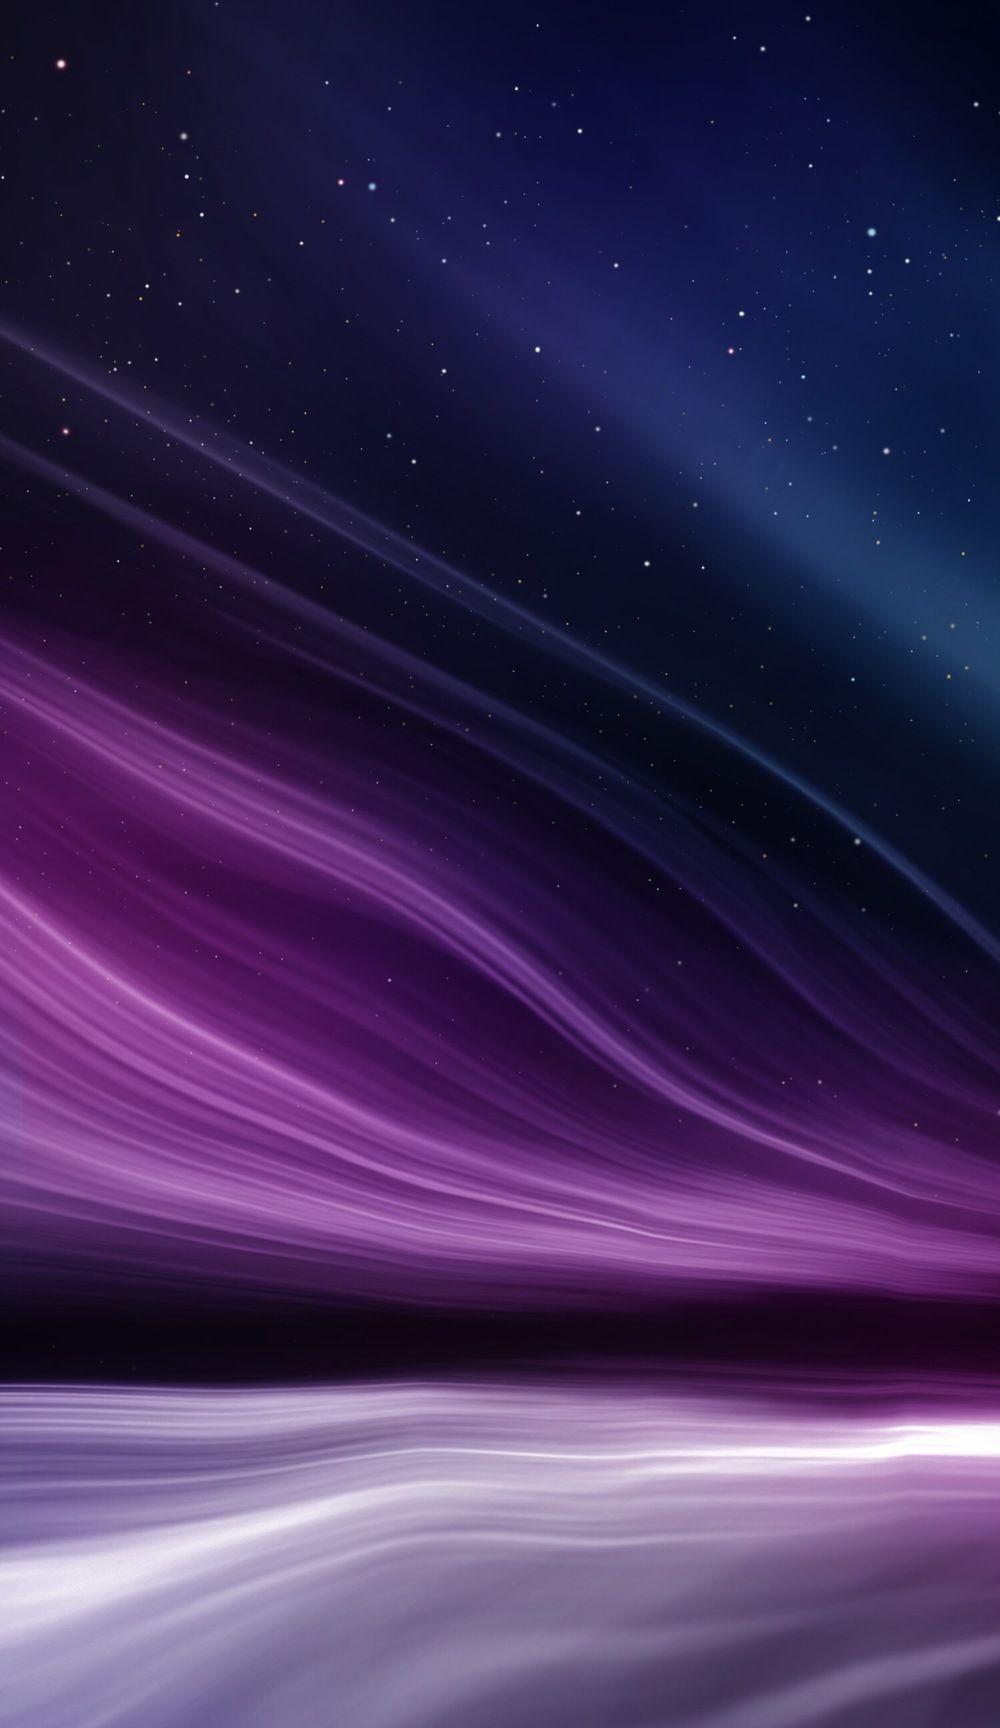 Purple Iphone Wallpapers Top Free Purple Iphone